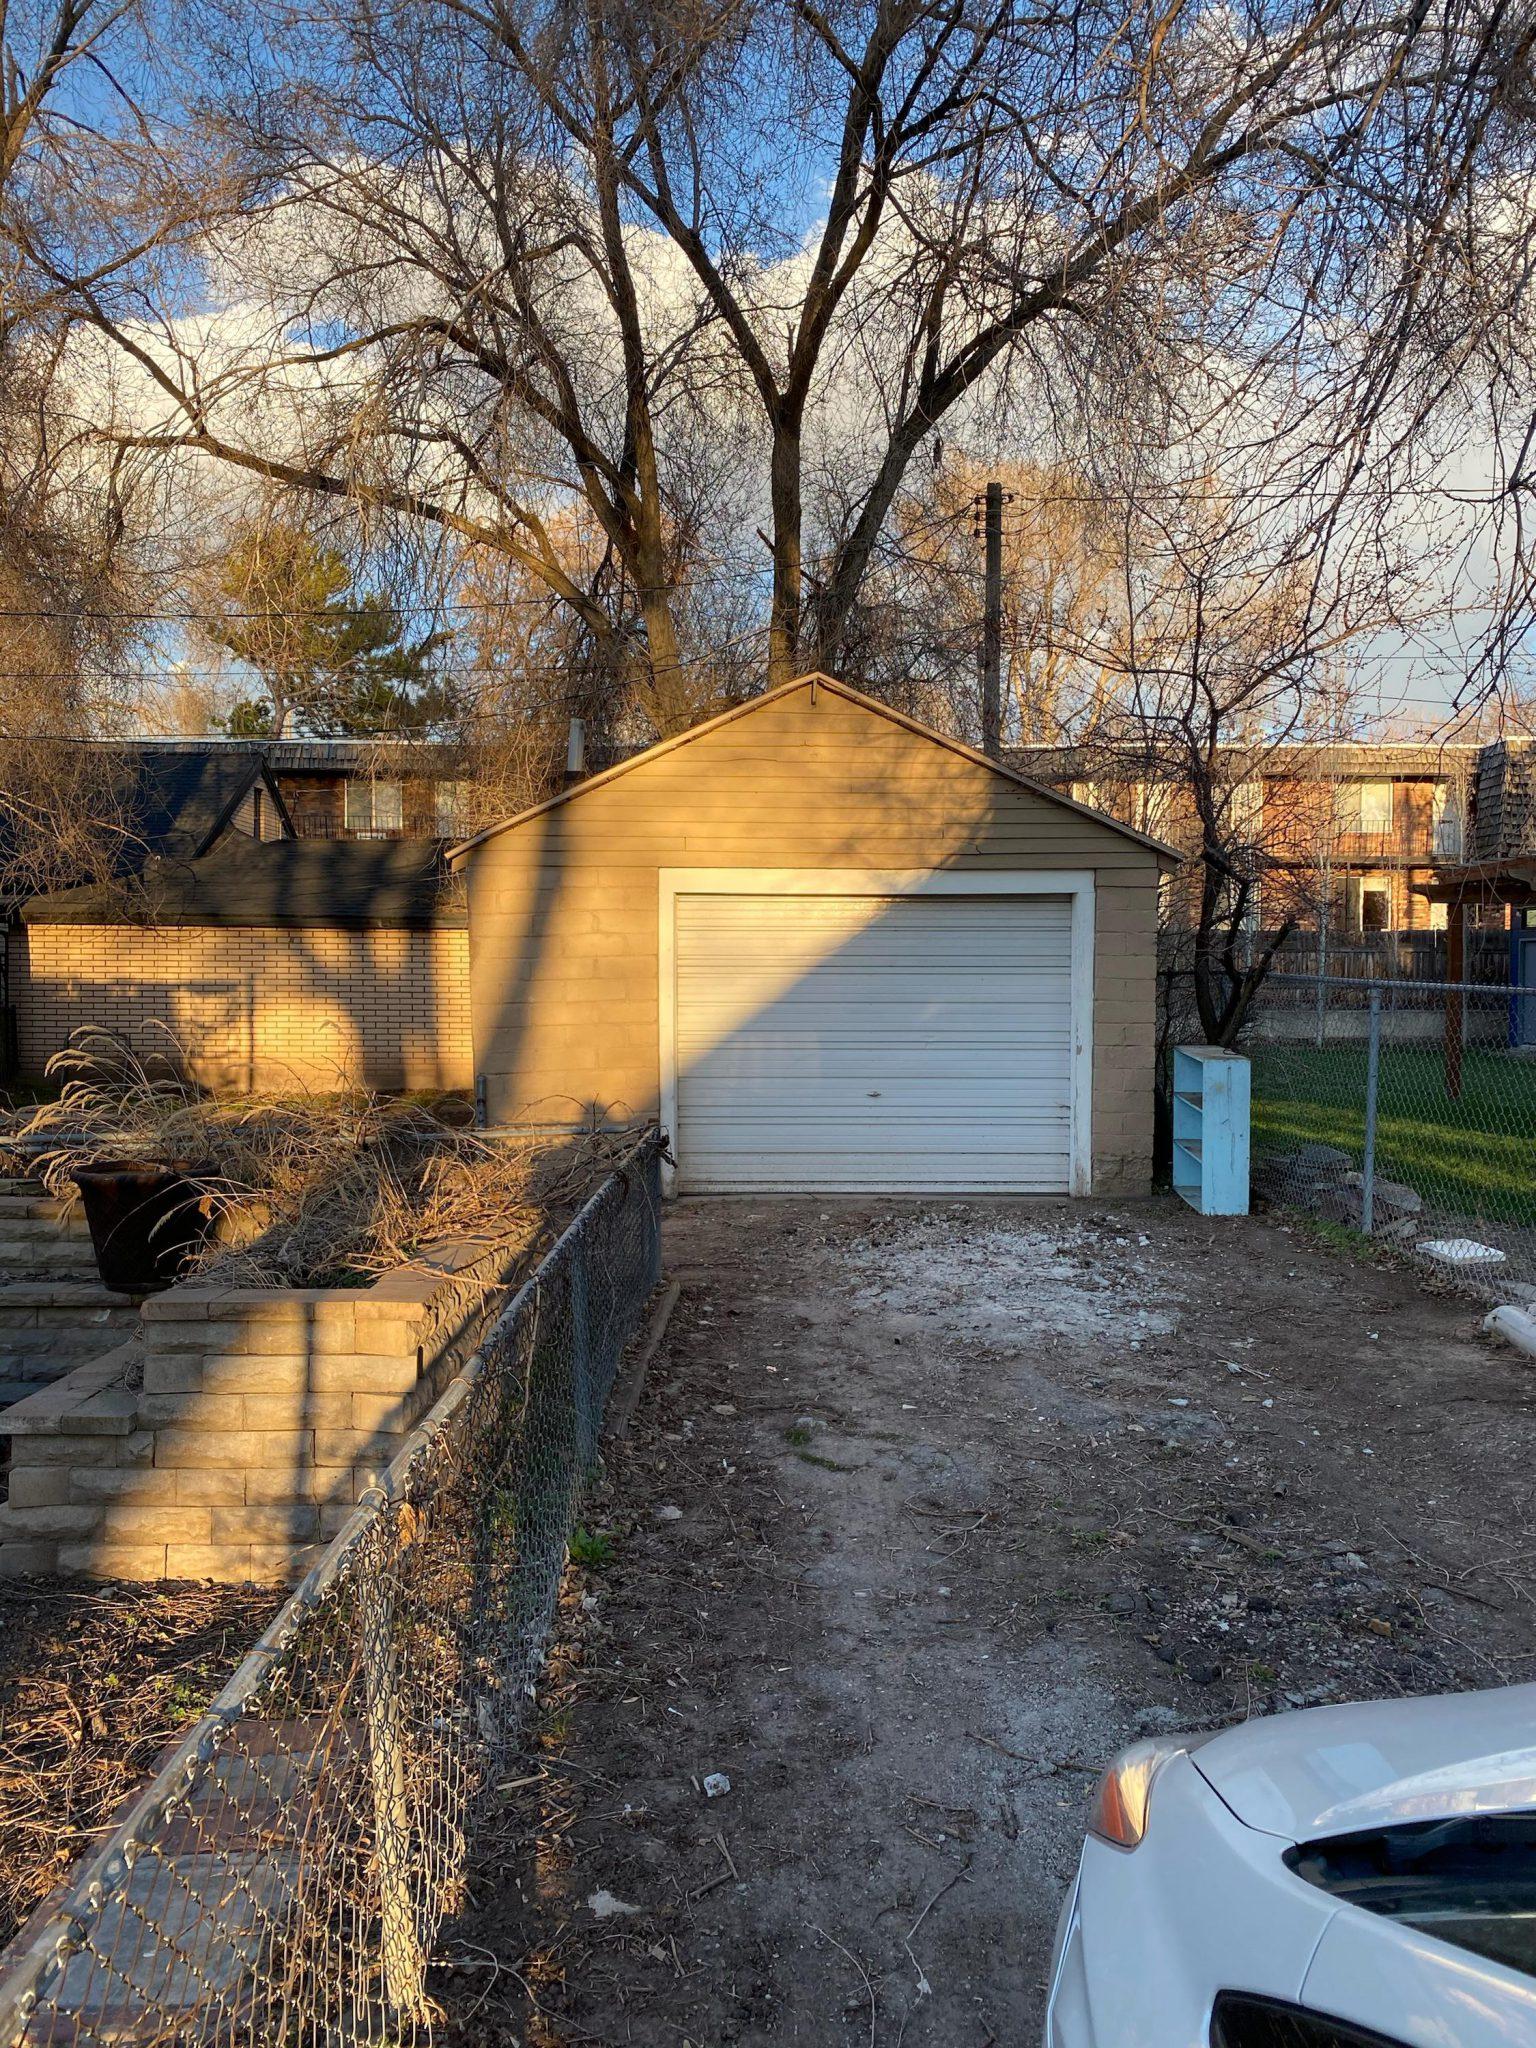 Private 24/7 Access Garage in SLC